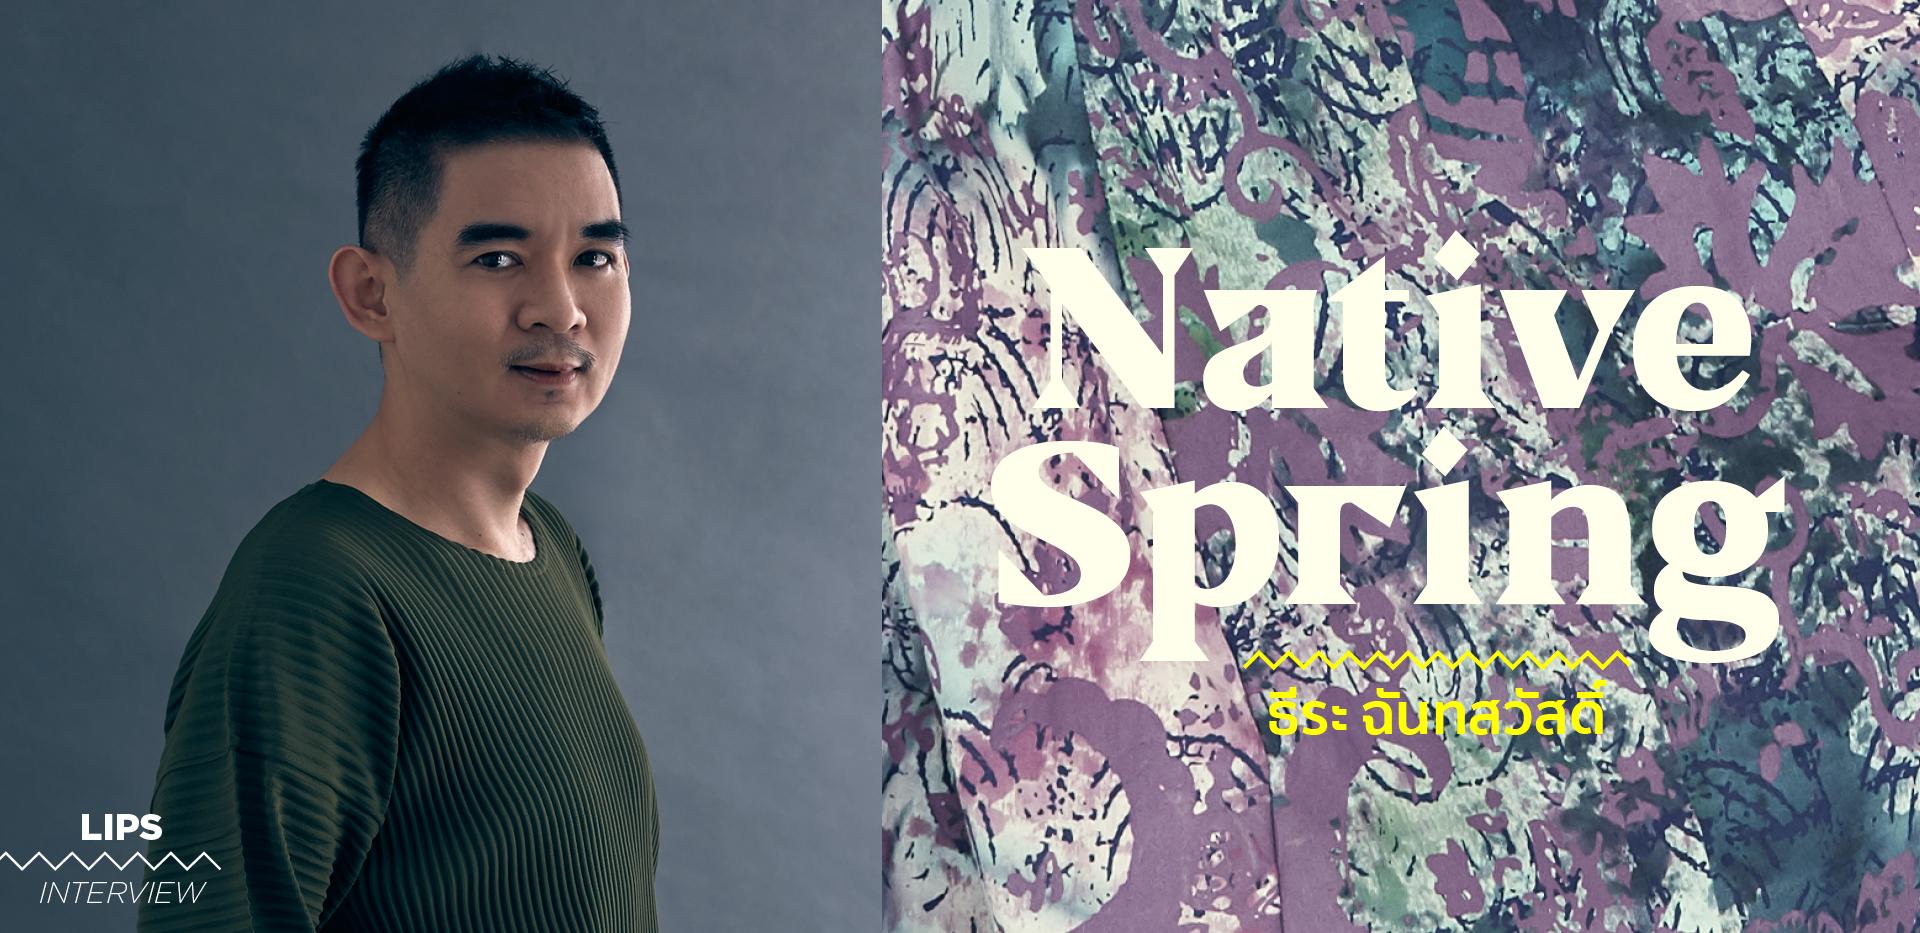 Native Spring – ธีระ ฉันทสวัสดิ์